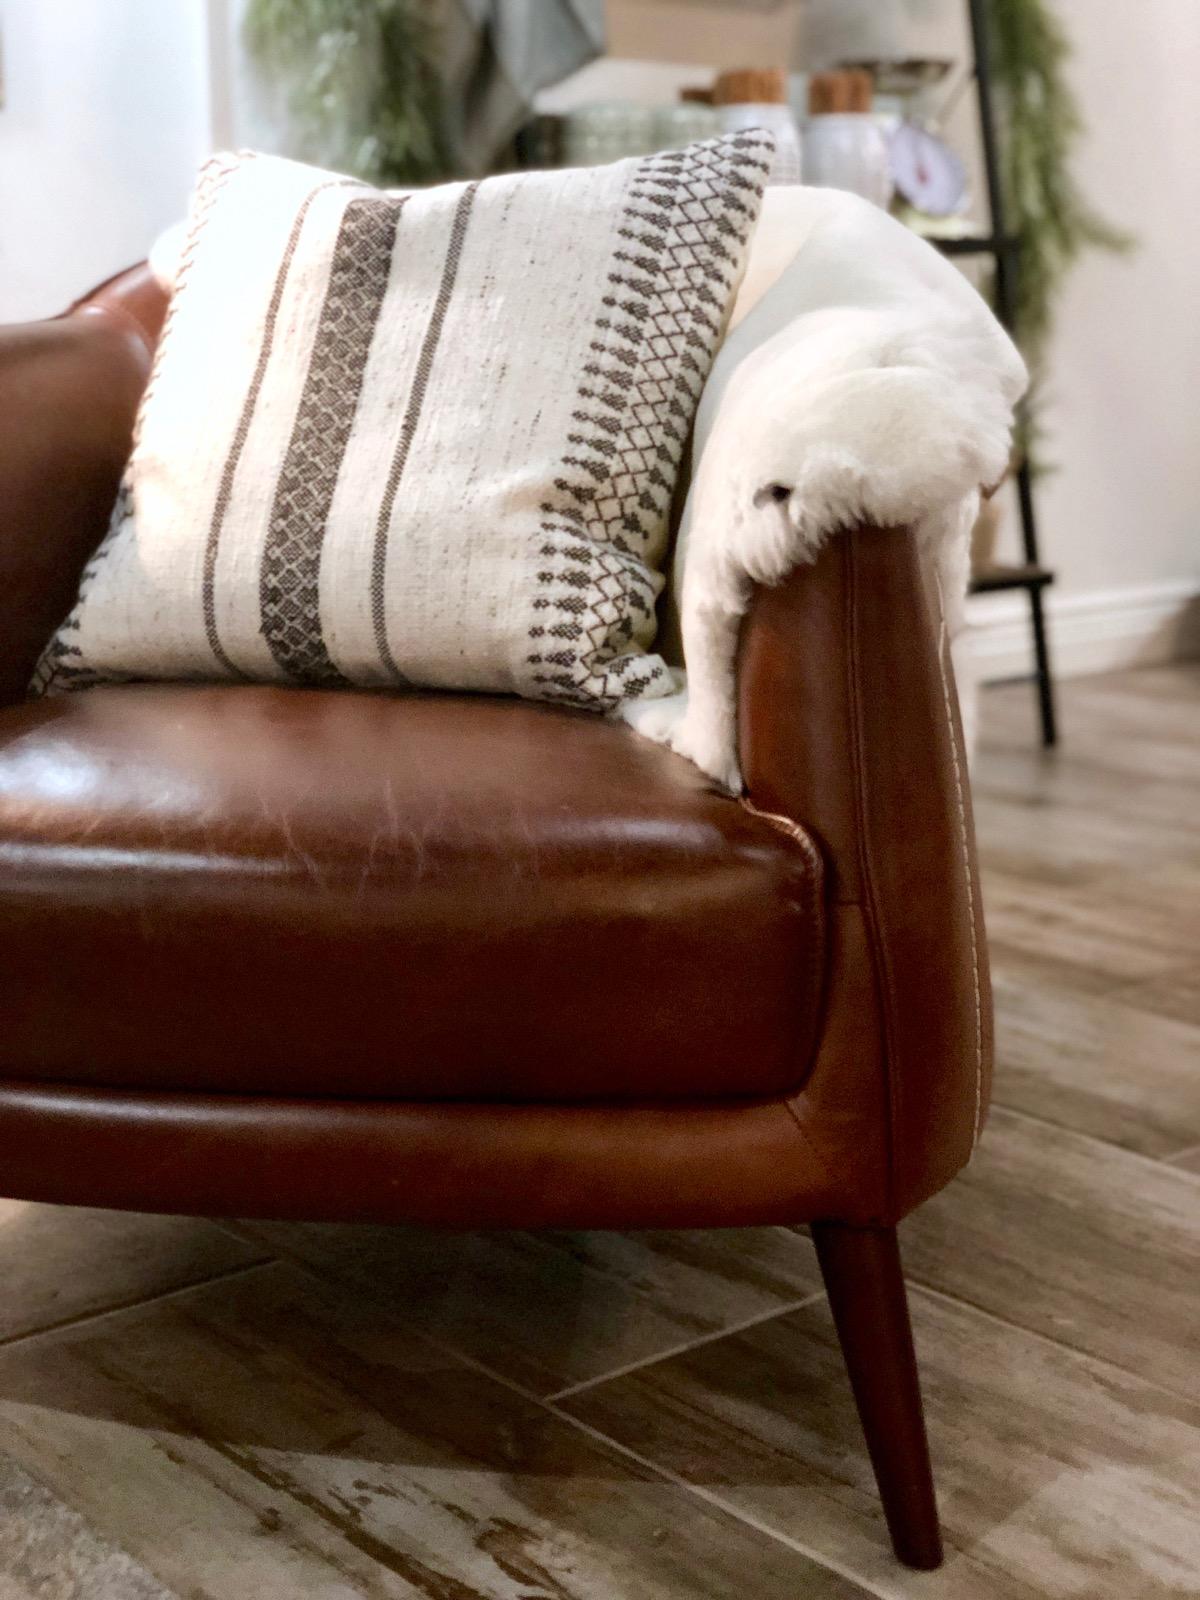 leather-chair-omaha-jaipur-sheepskin-amethyst-home